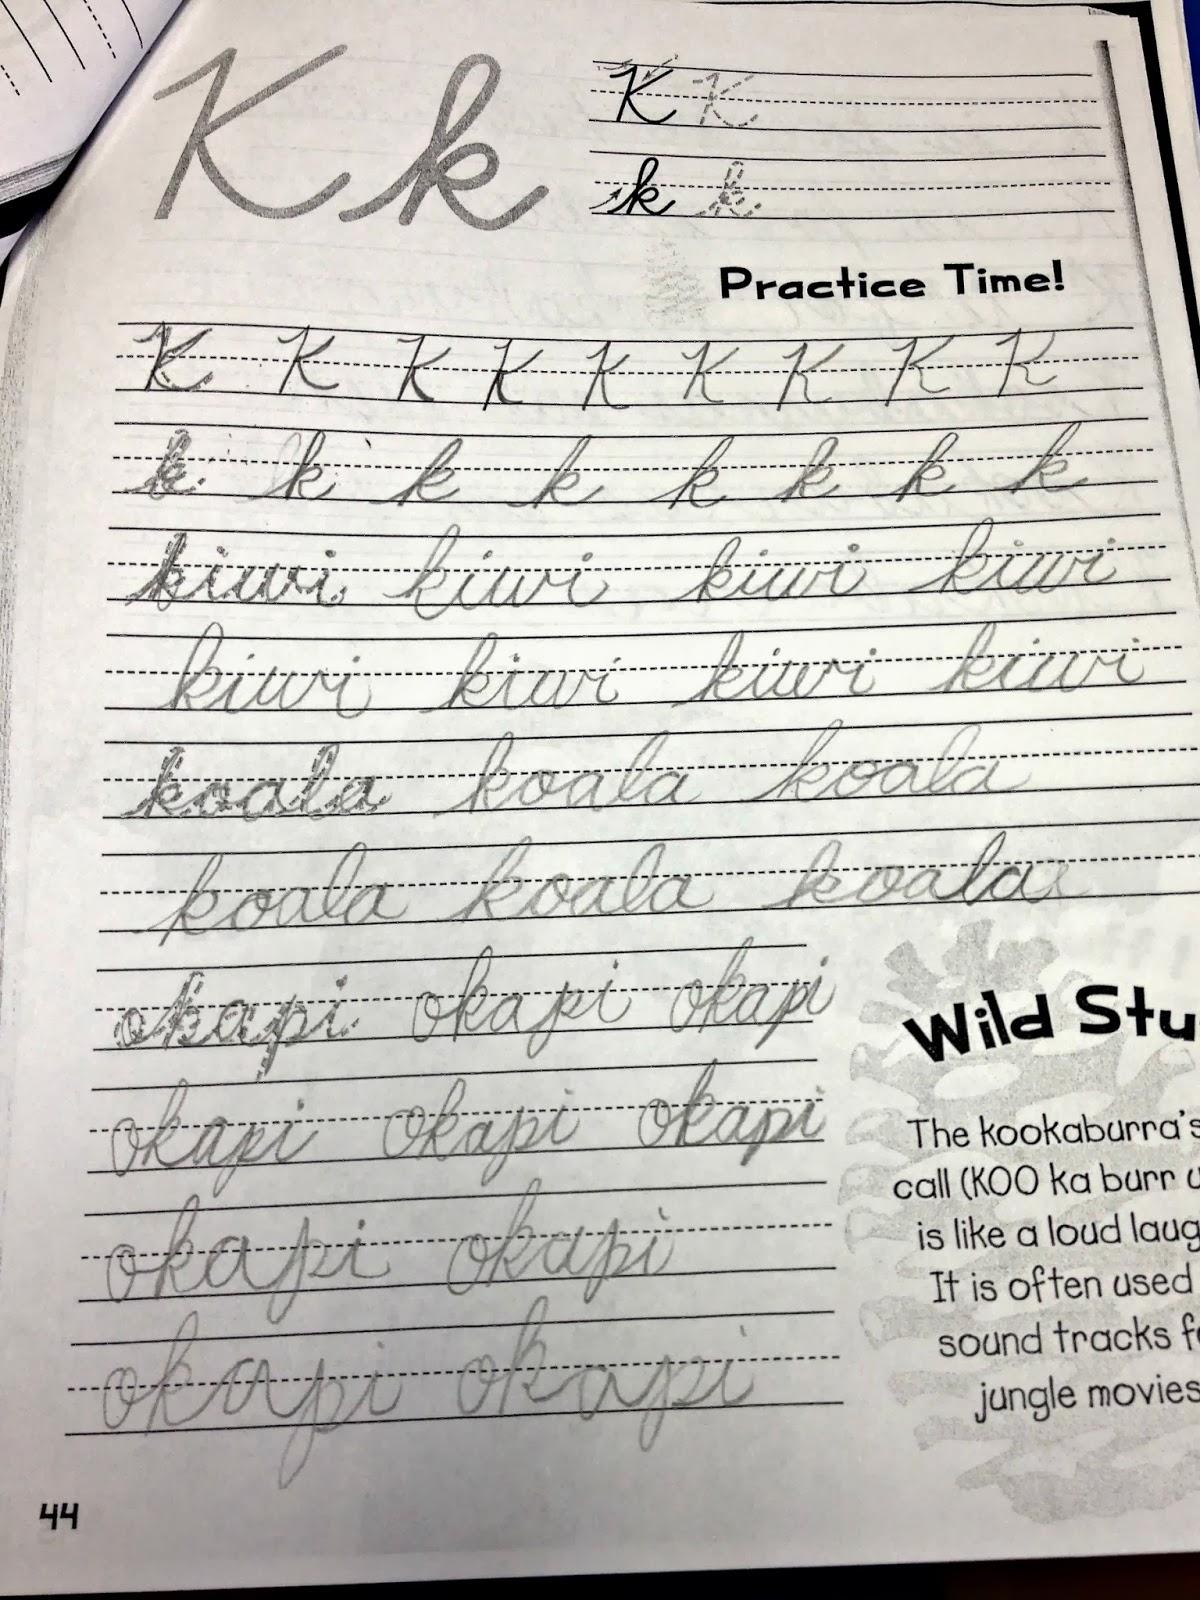 Punk Rock Parents Homeschool Week 22 Cursive Writing